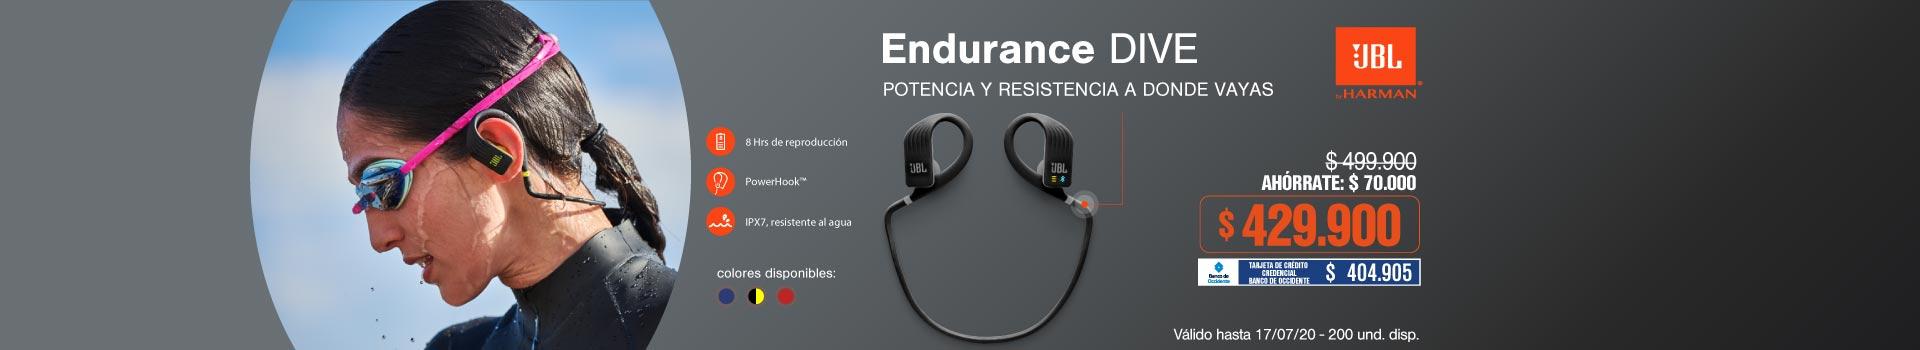 AK-AUDIFONOS-BCAT2-JBL-ENDURANCE-DIVE-11JULIO2020